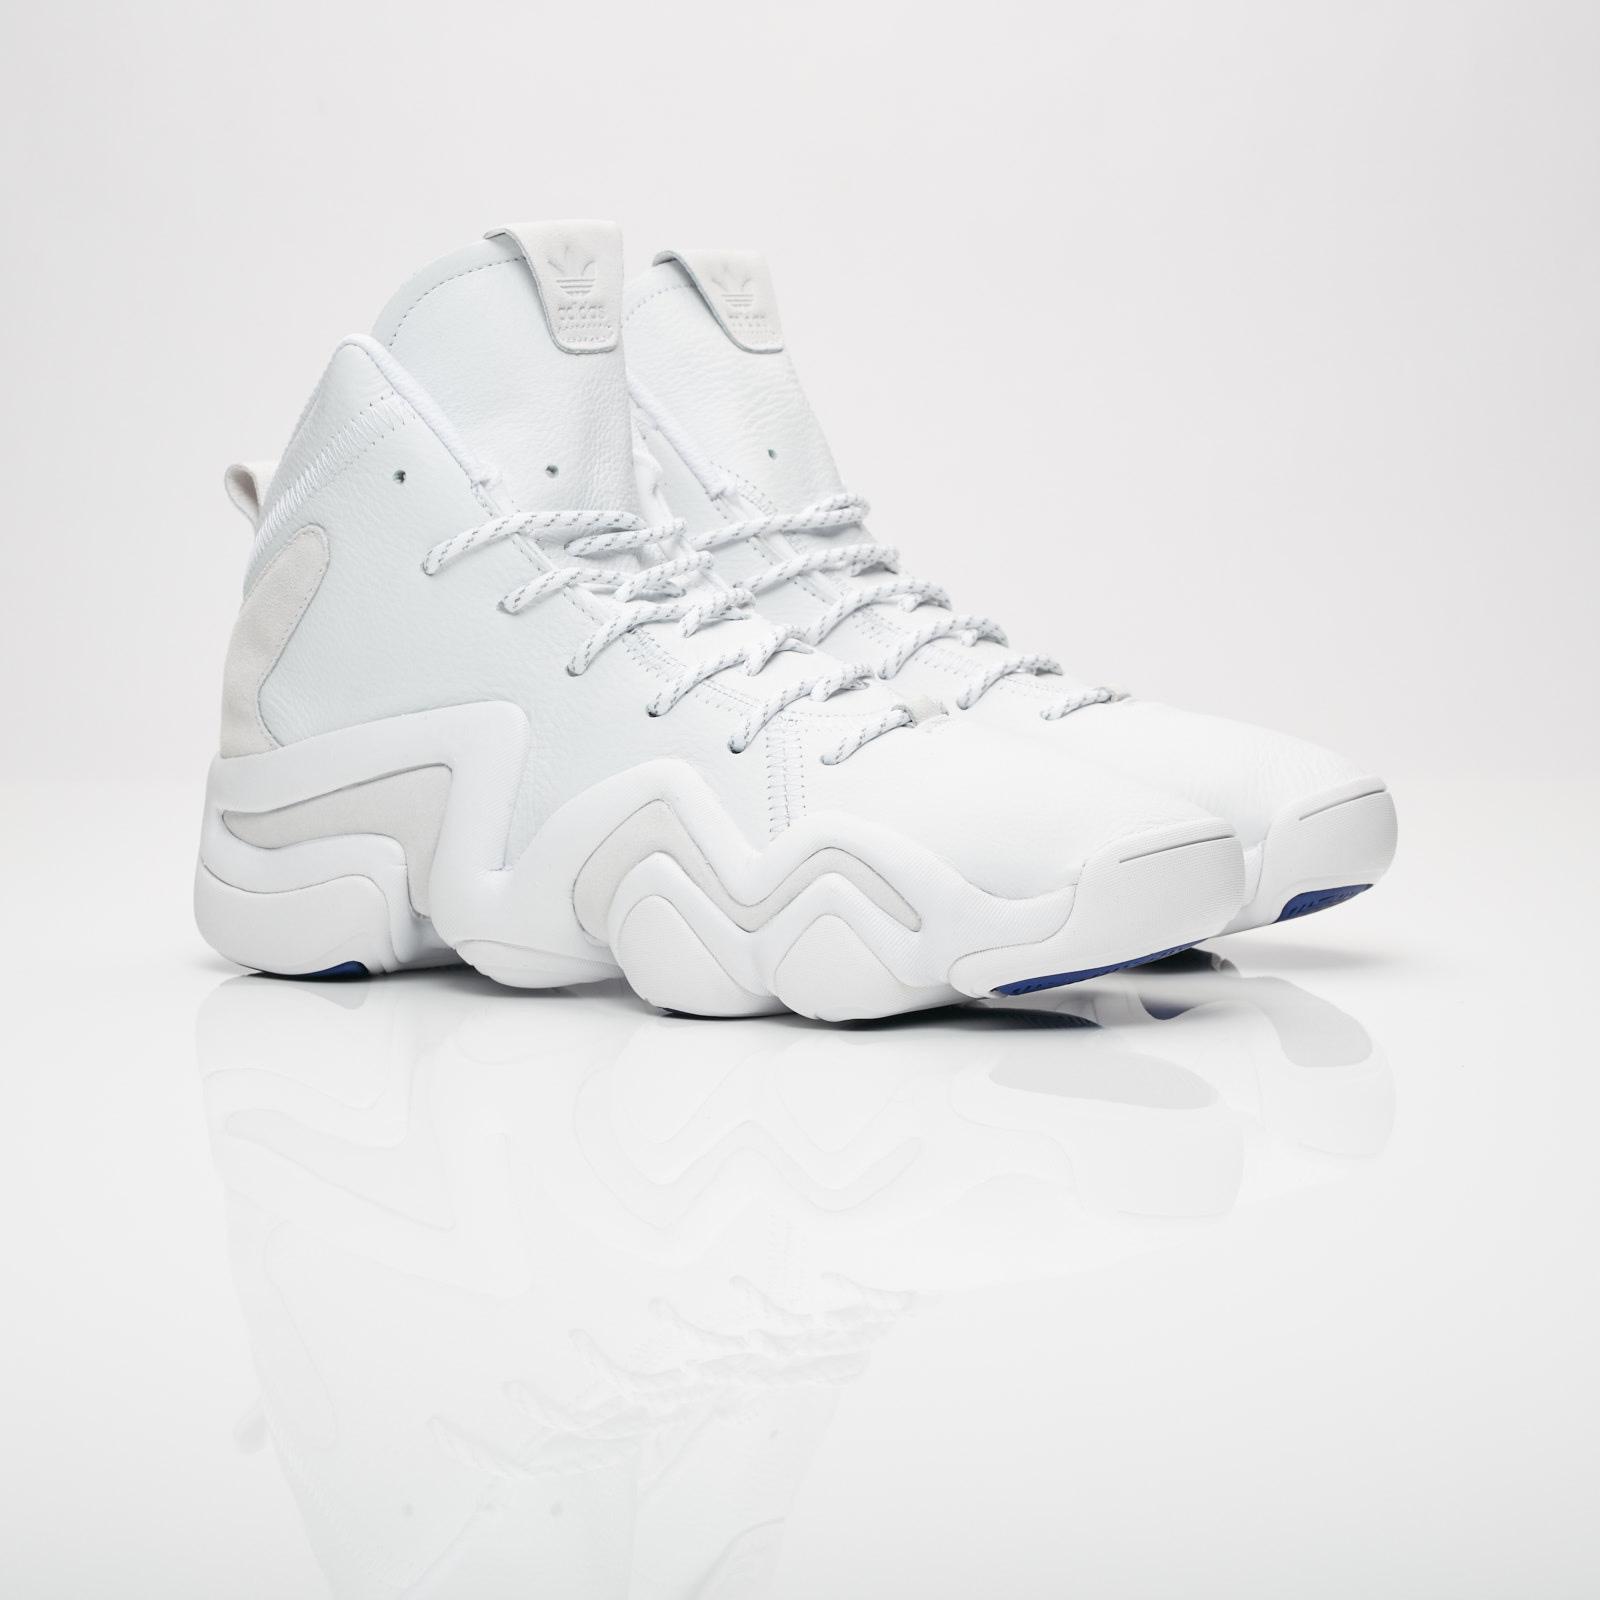 24137b8540 adidas Crazy 8 ADV (ASW) - Cq0990 - Sneakersnstuff   sneakers ...